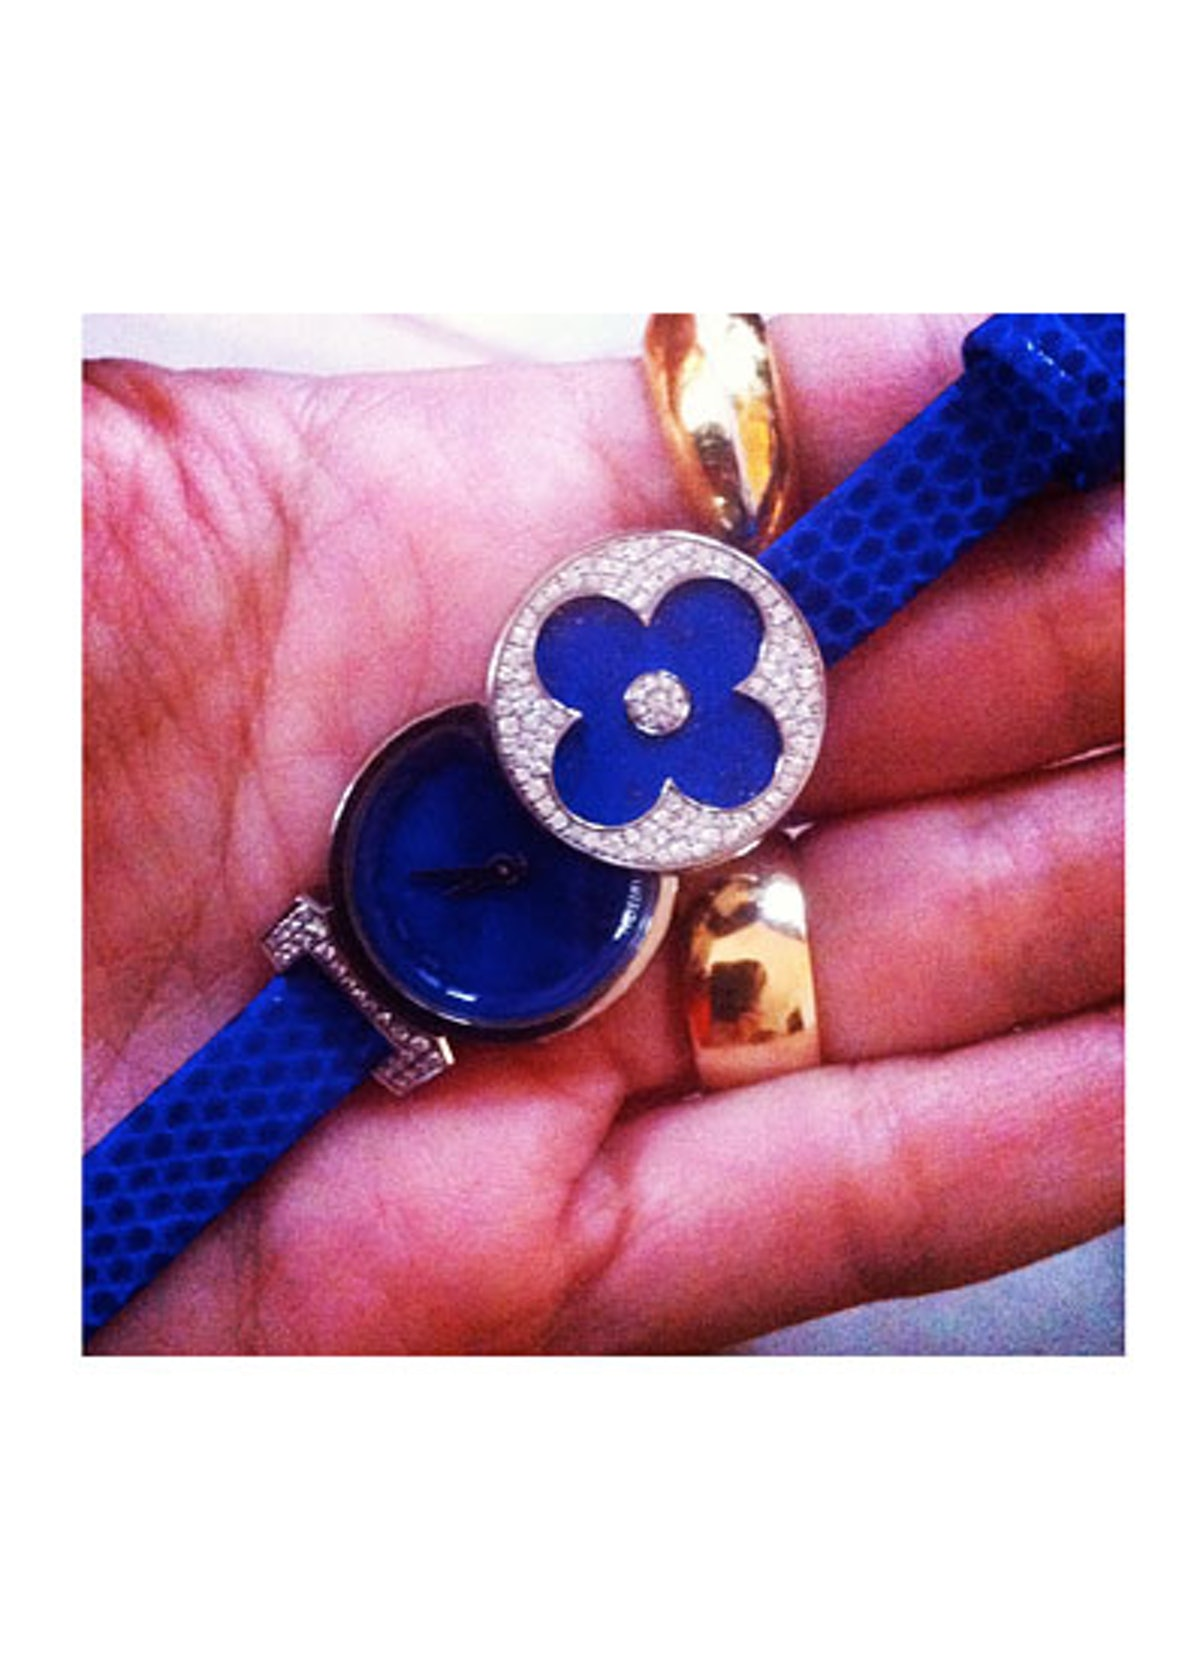 acss-claudia-mata-blue-watches-03-v.jpg